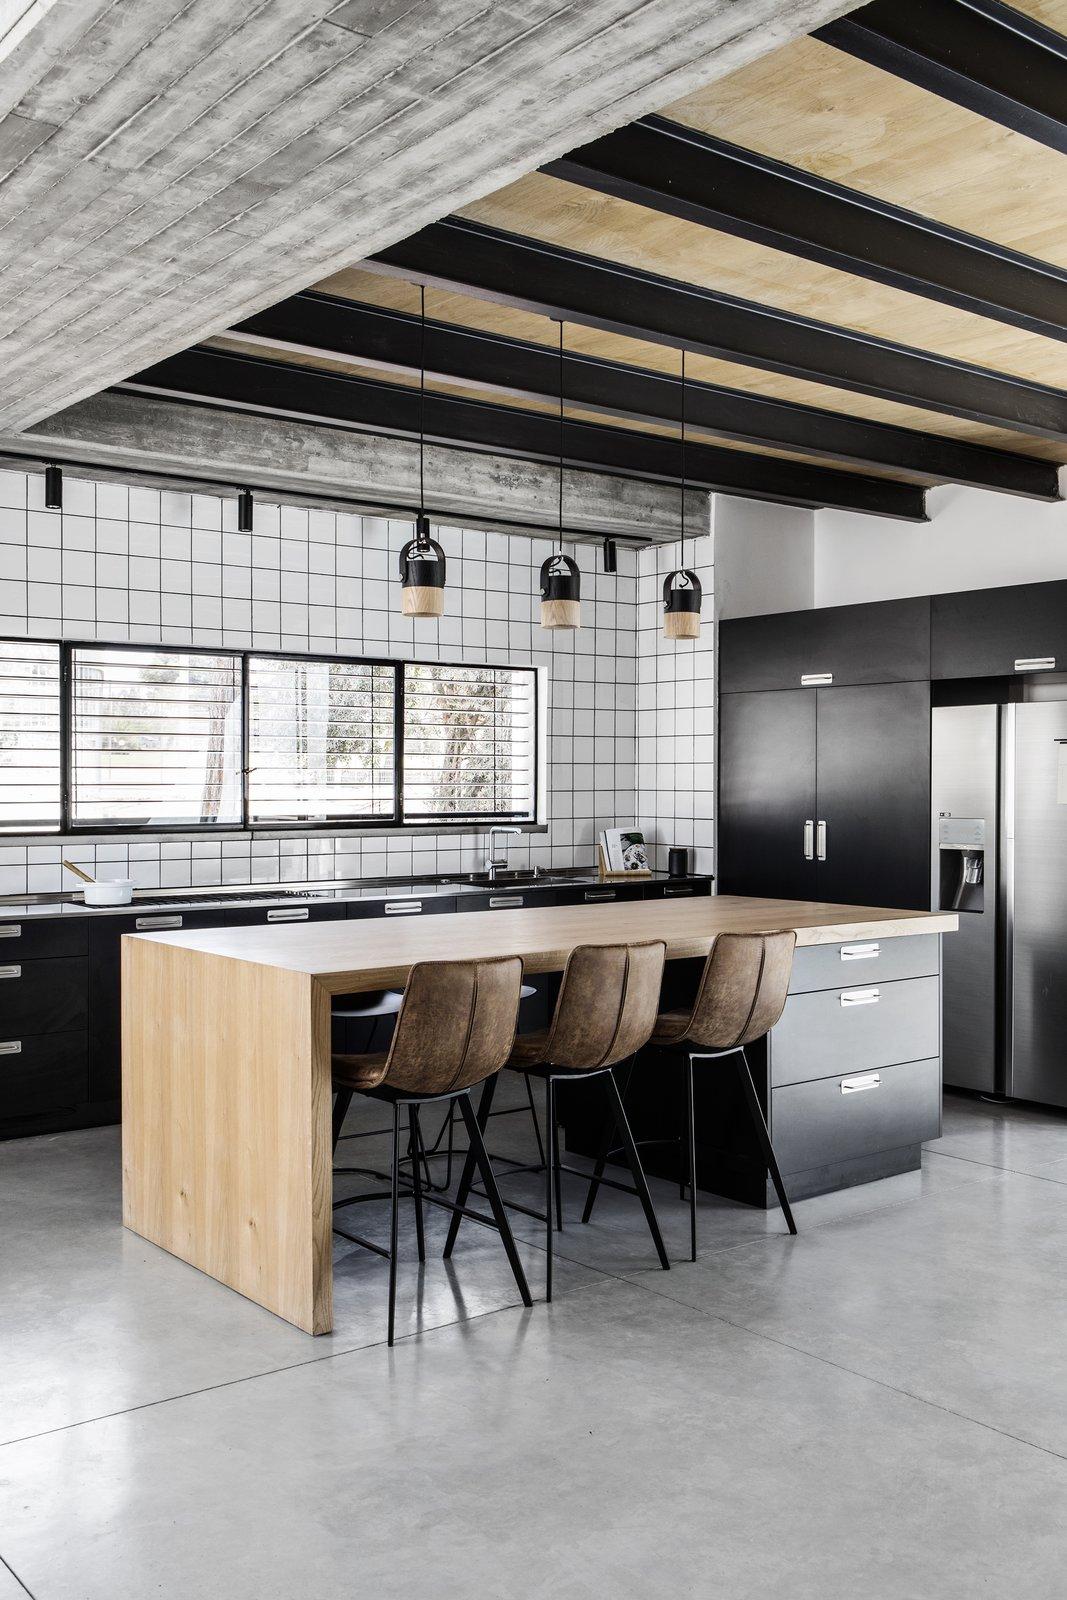 Kitchen, Refrigerator, Cooktops, Metal Counter, Colorful Cabinet, Concrete Floor, Ceramic Tile Backsplashe, Ceiling Lighting, and Pendant Lighting  Nir Am House by Shir Shtaigman